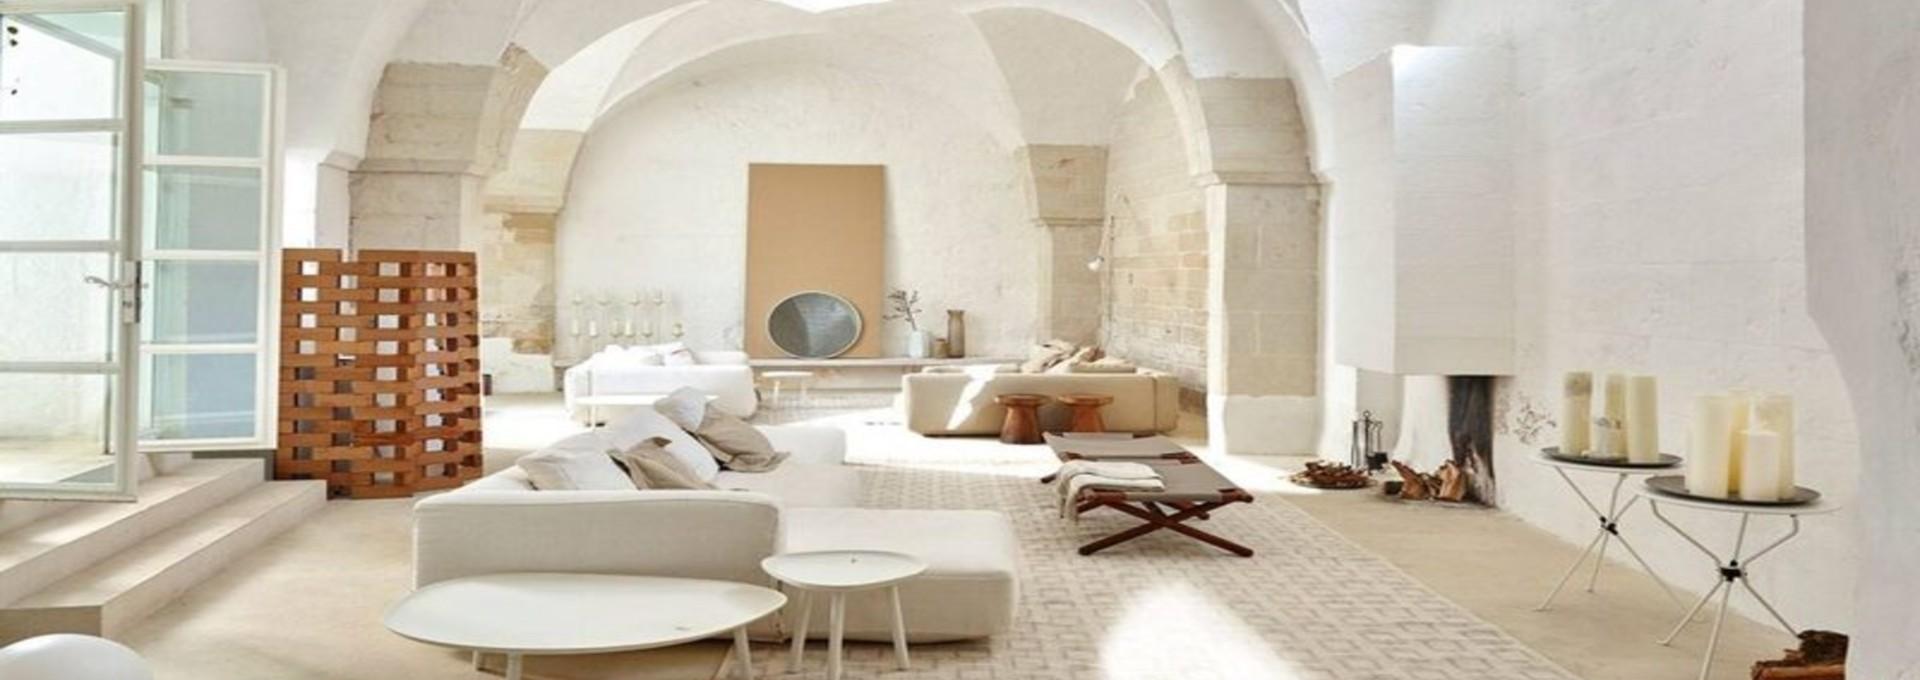 Palma de Mallorca Designers That Impress With their Interiors